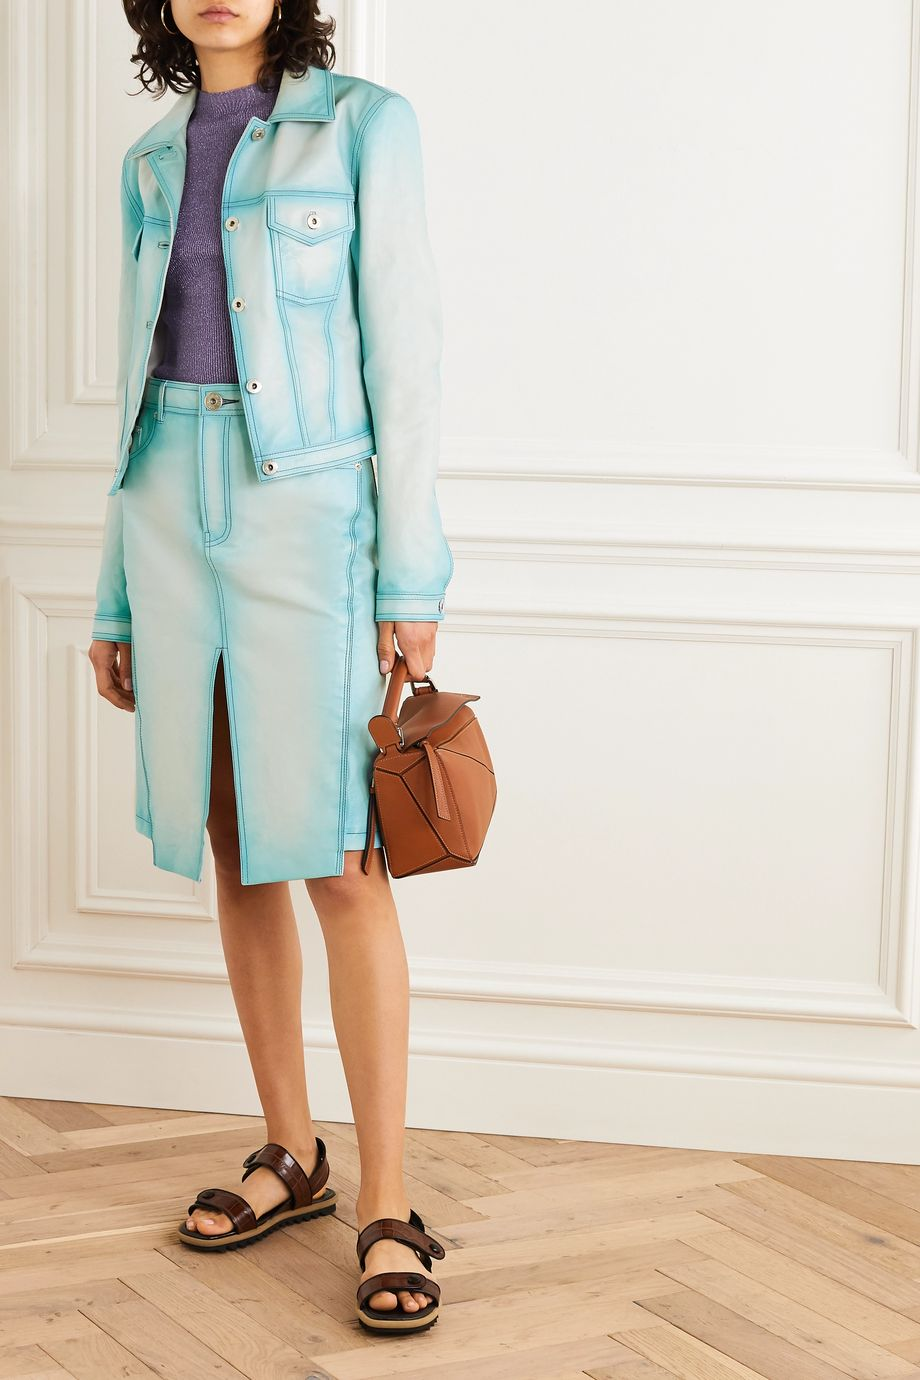 Lanvin Asymmetric leather skirt